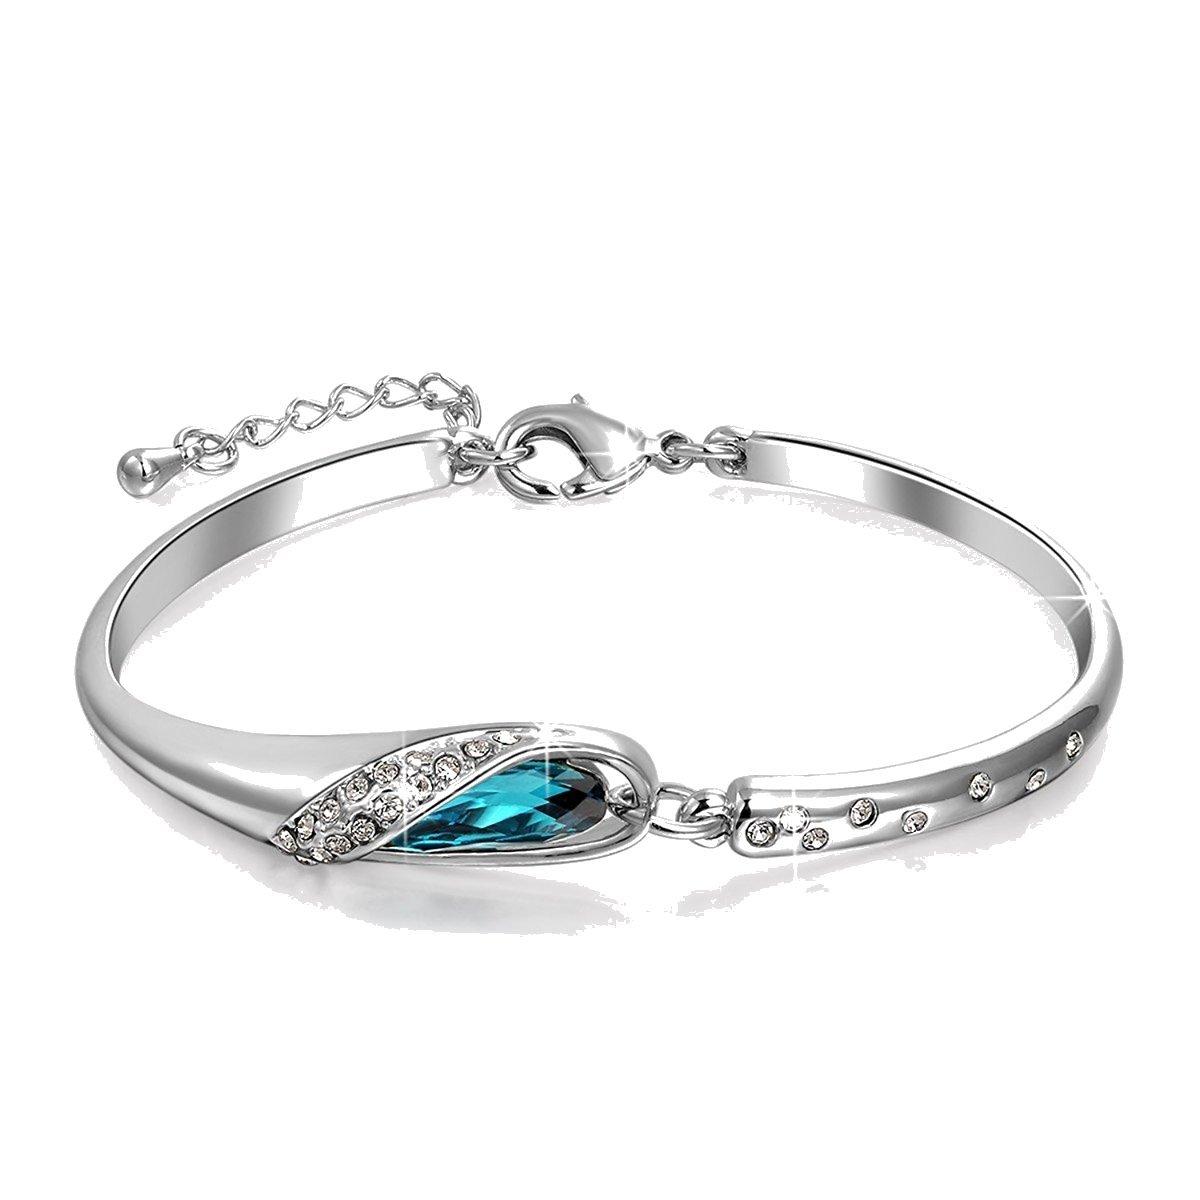 Crystals from Swarovski Bermuda Blue Bangle Bracelet Silver Plated for Women 7 Crystalline CR-AZ-0066